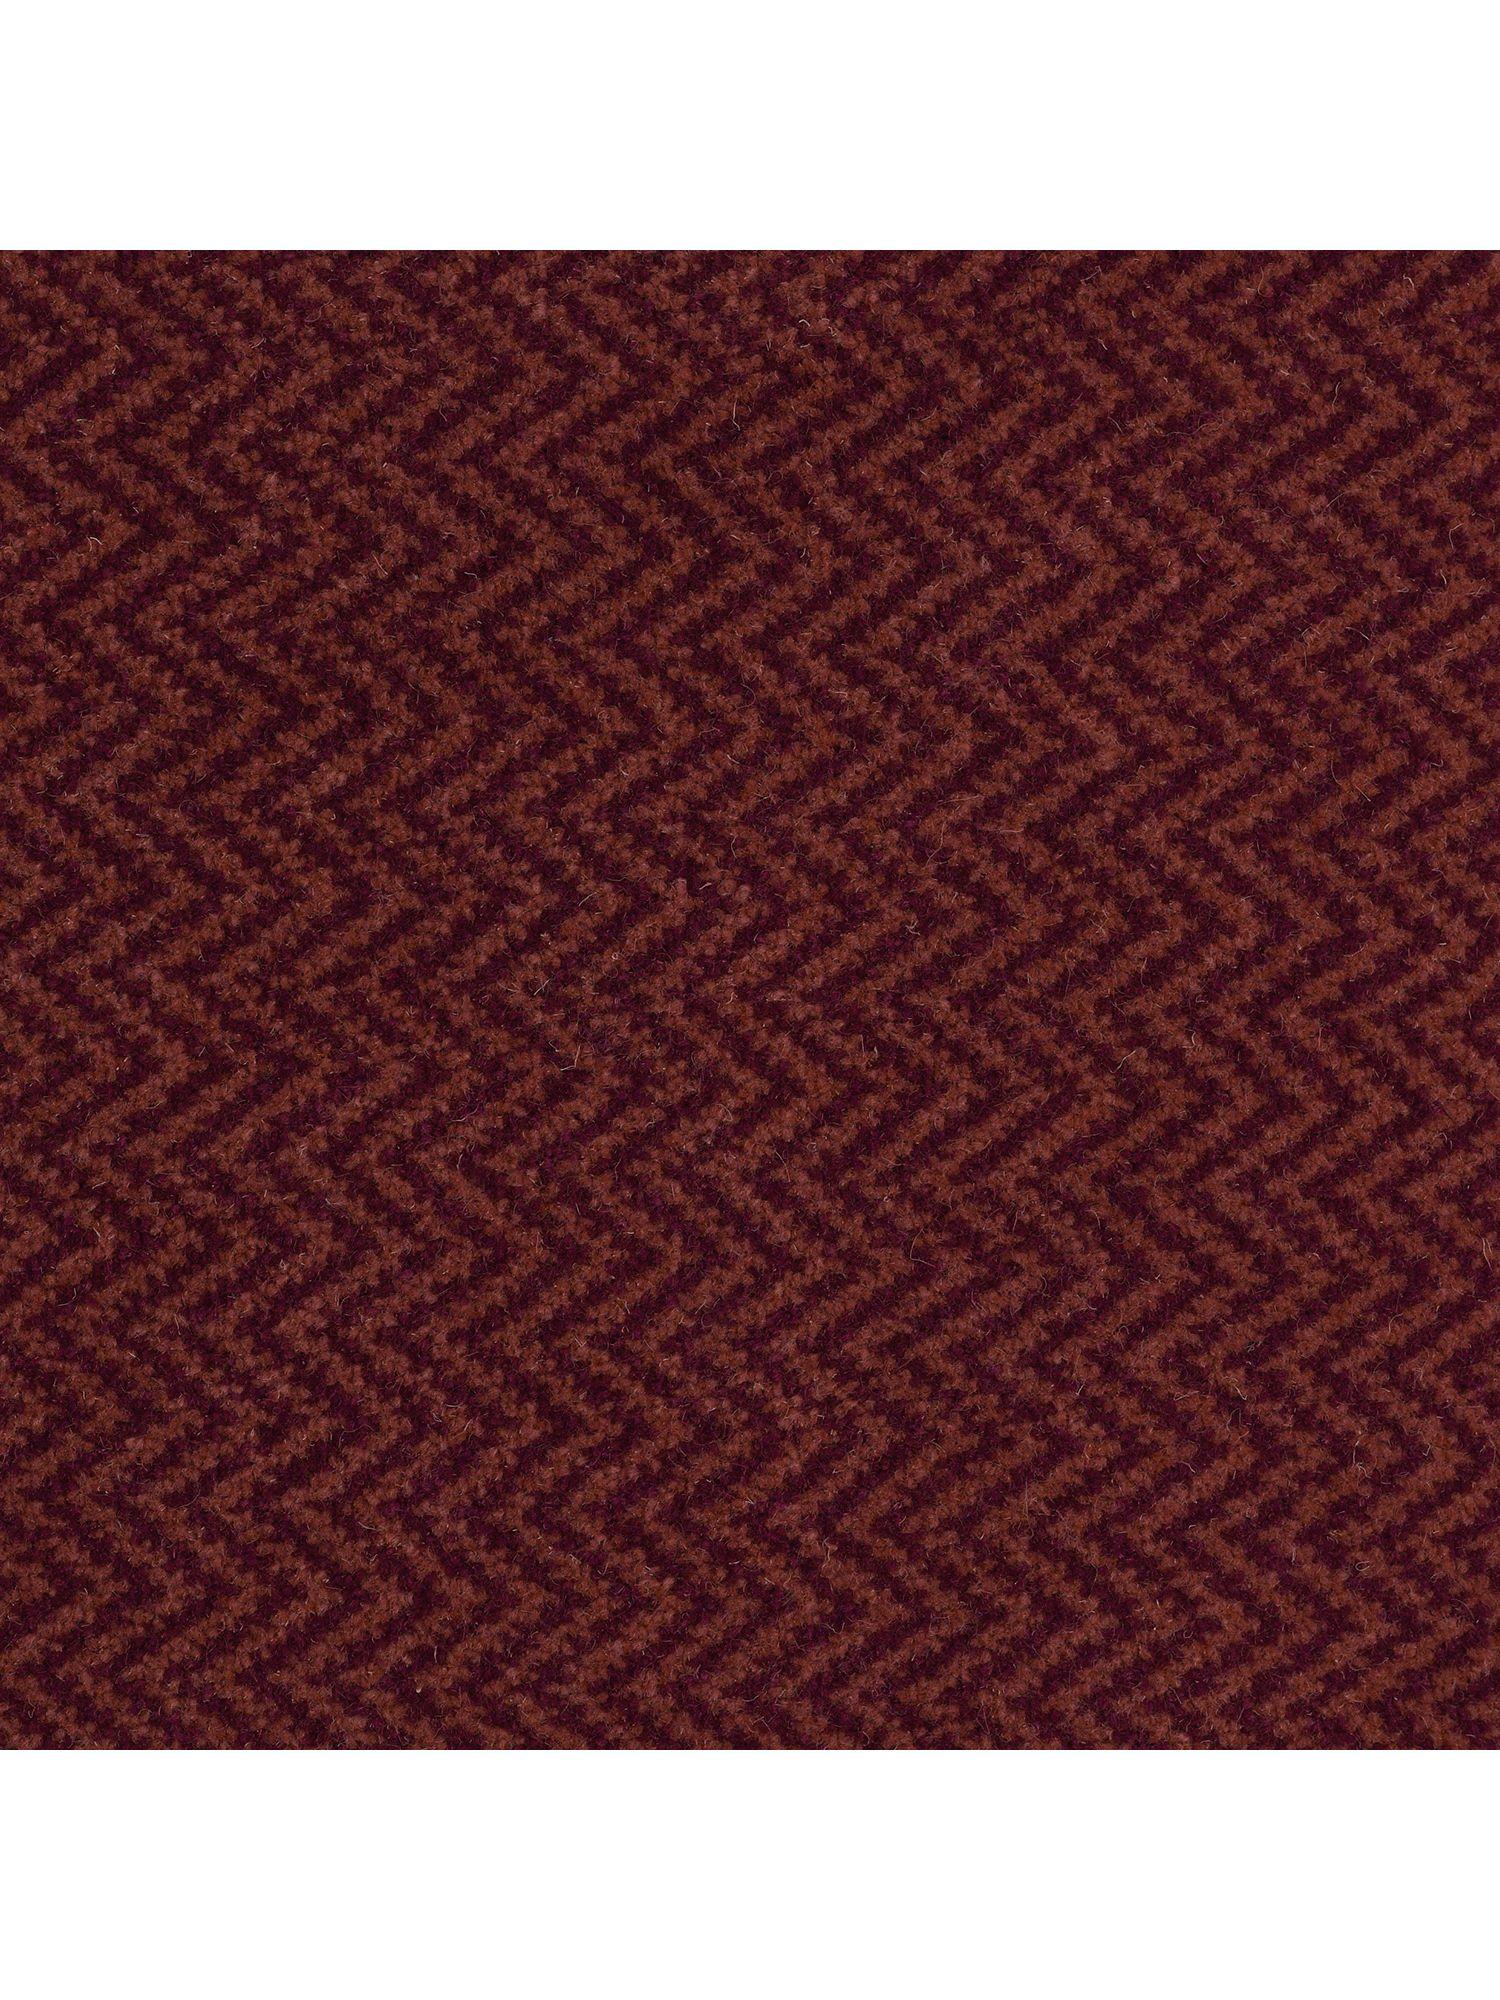 Adam Carpets Adam Carpets Flare Twist Carpet